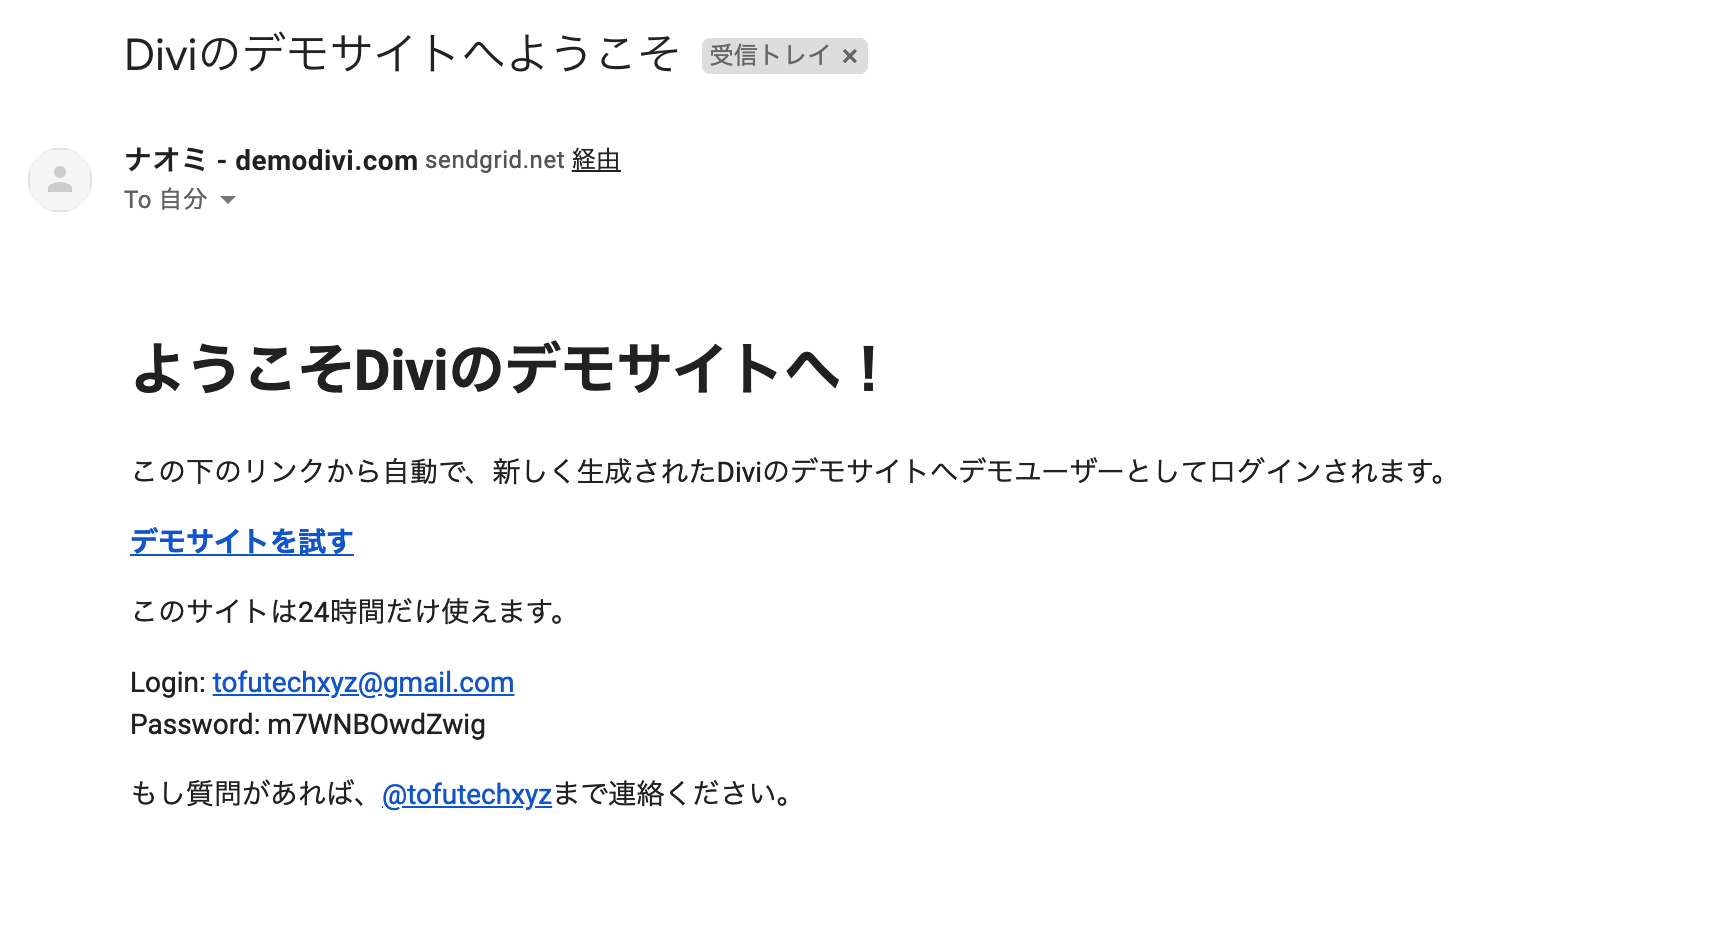 Diviのデモサイトを始める手順、メールをチェック